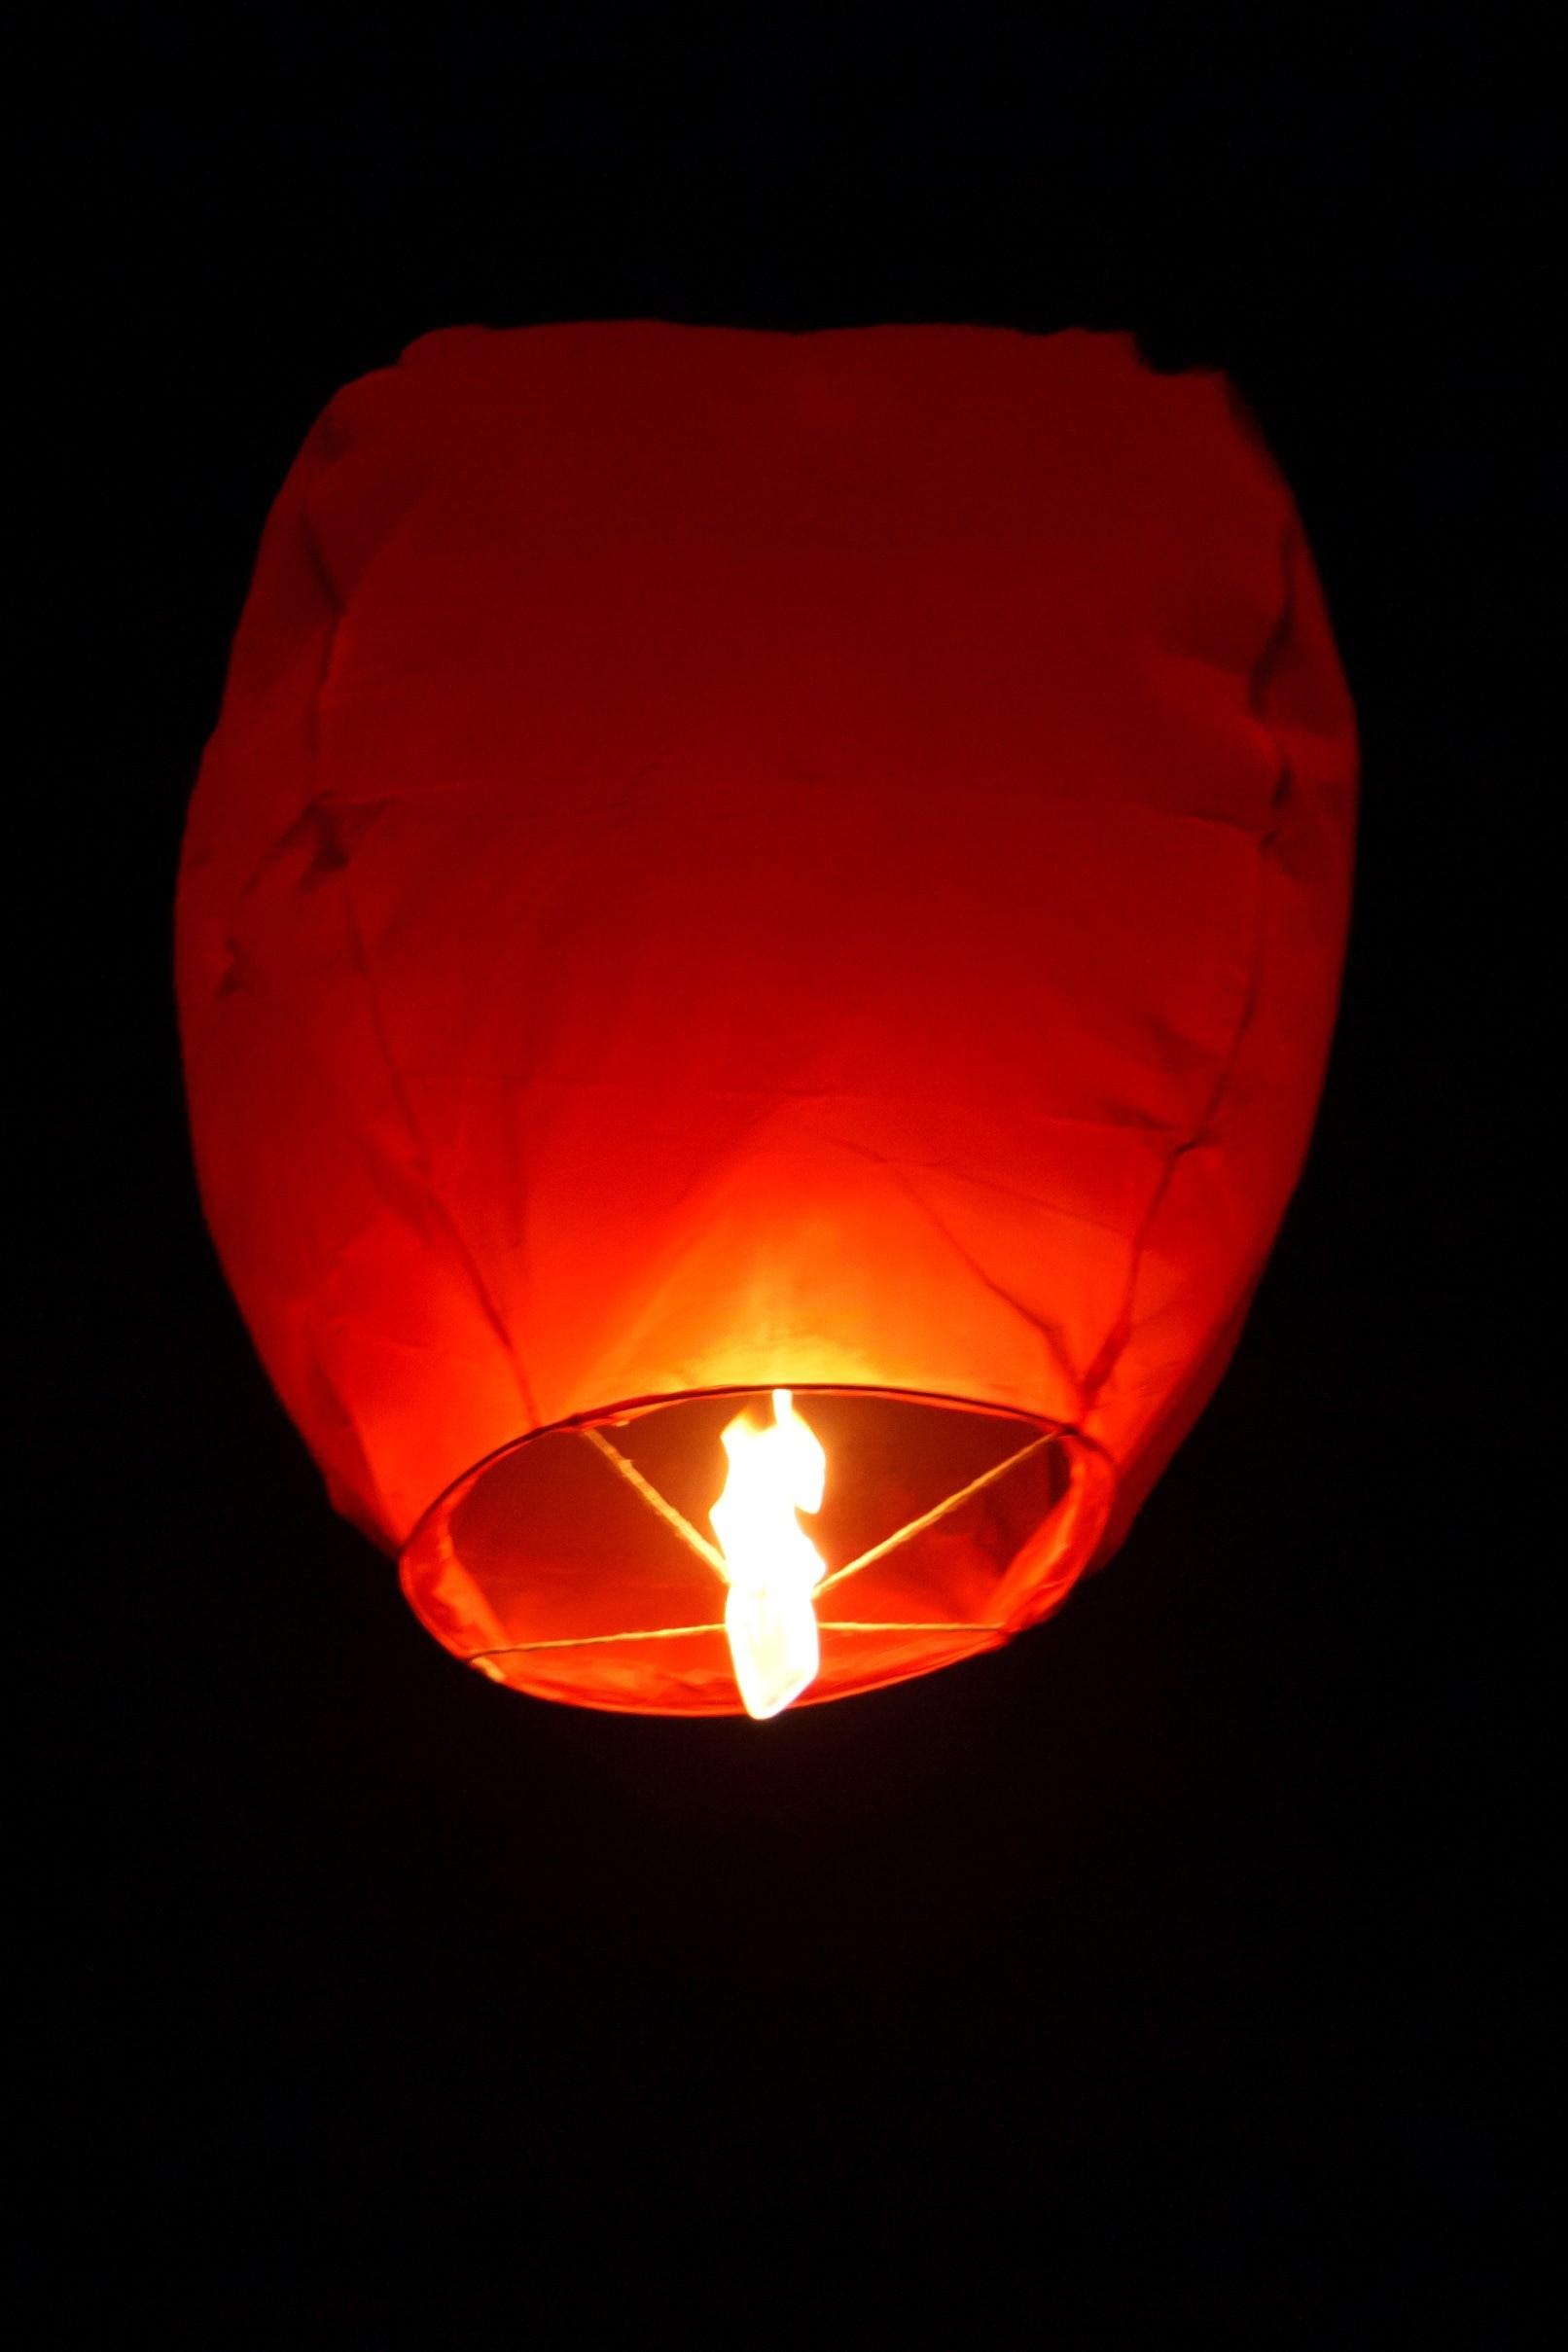 1239796 vertical chinese lantern wallpaper 1612x2418 hd 1080p